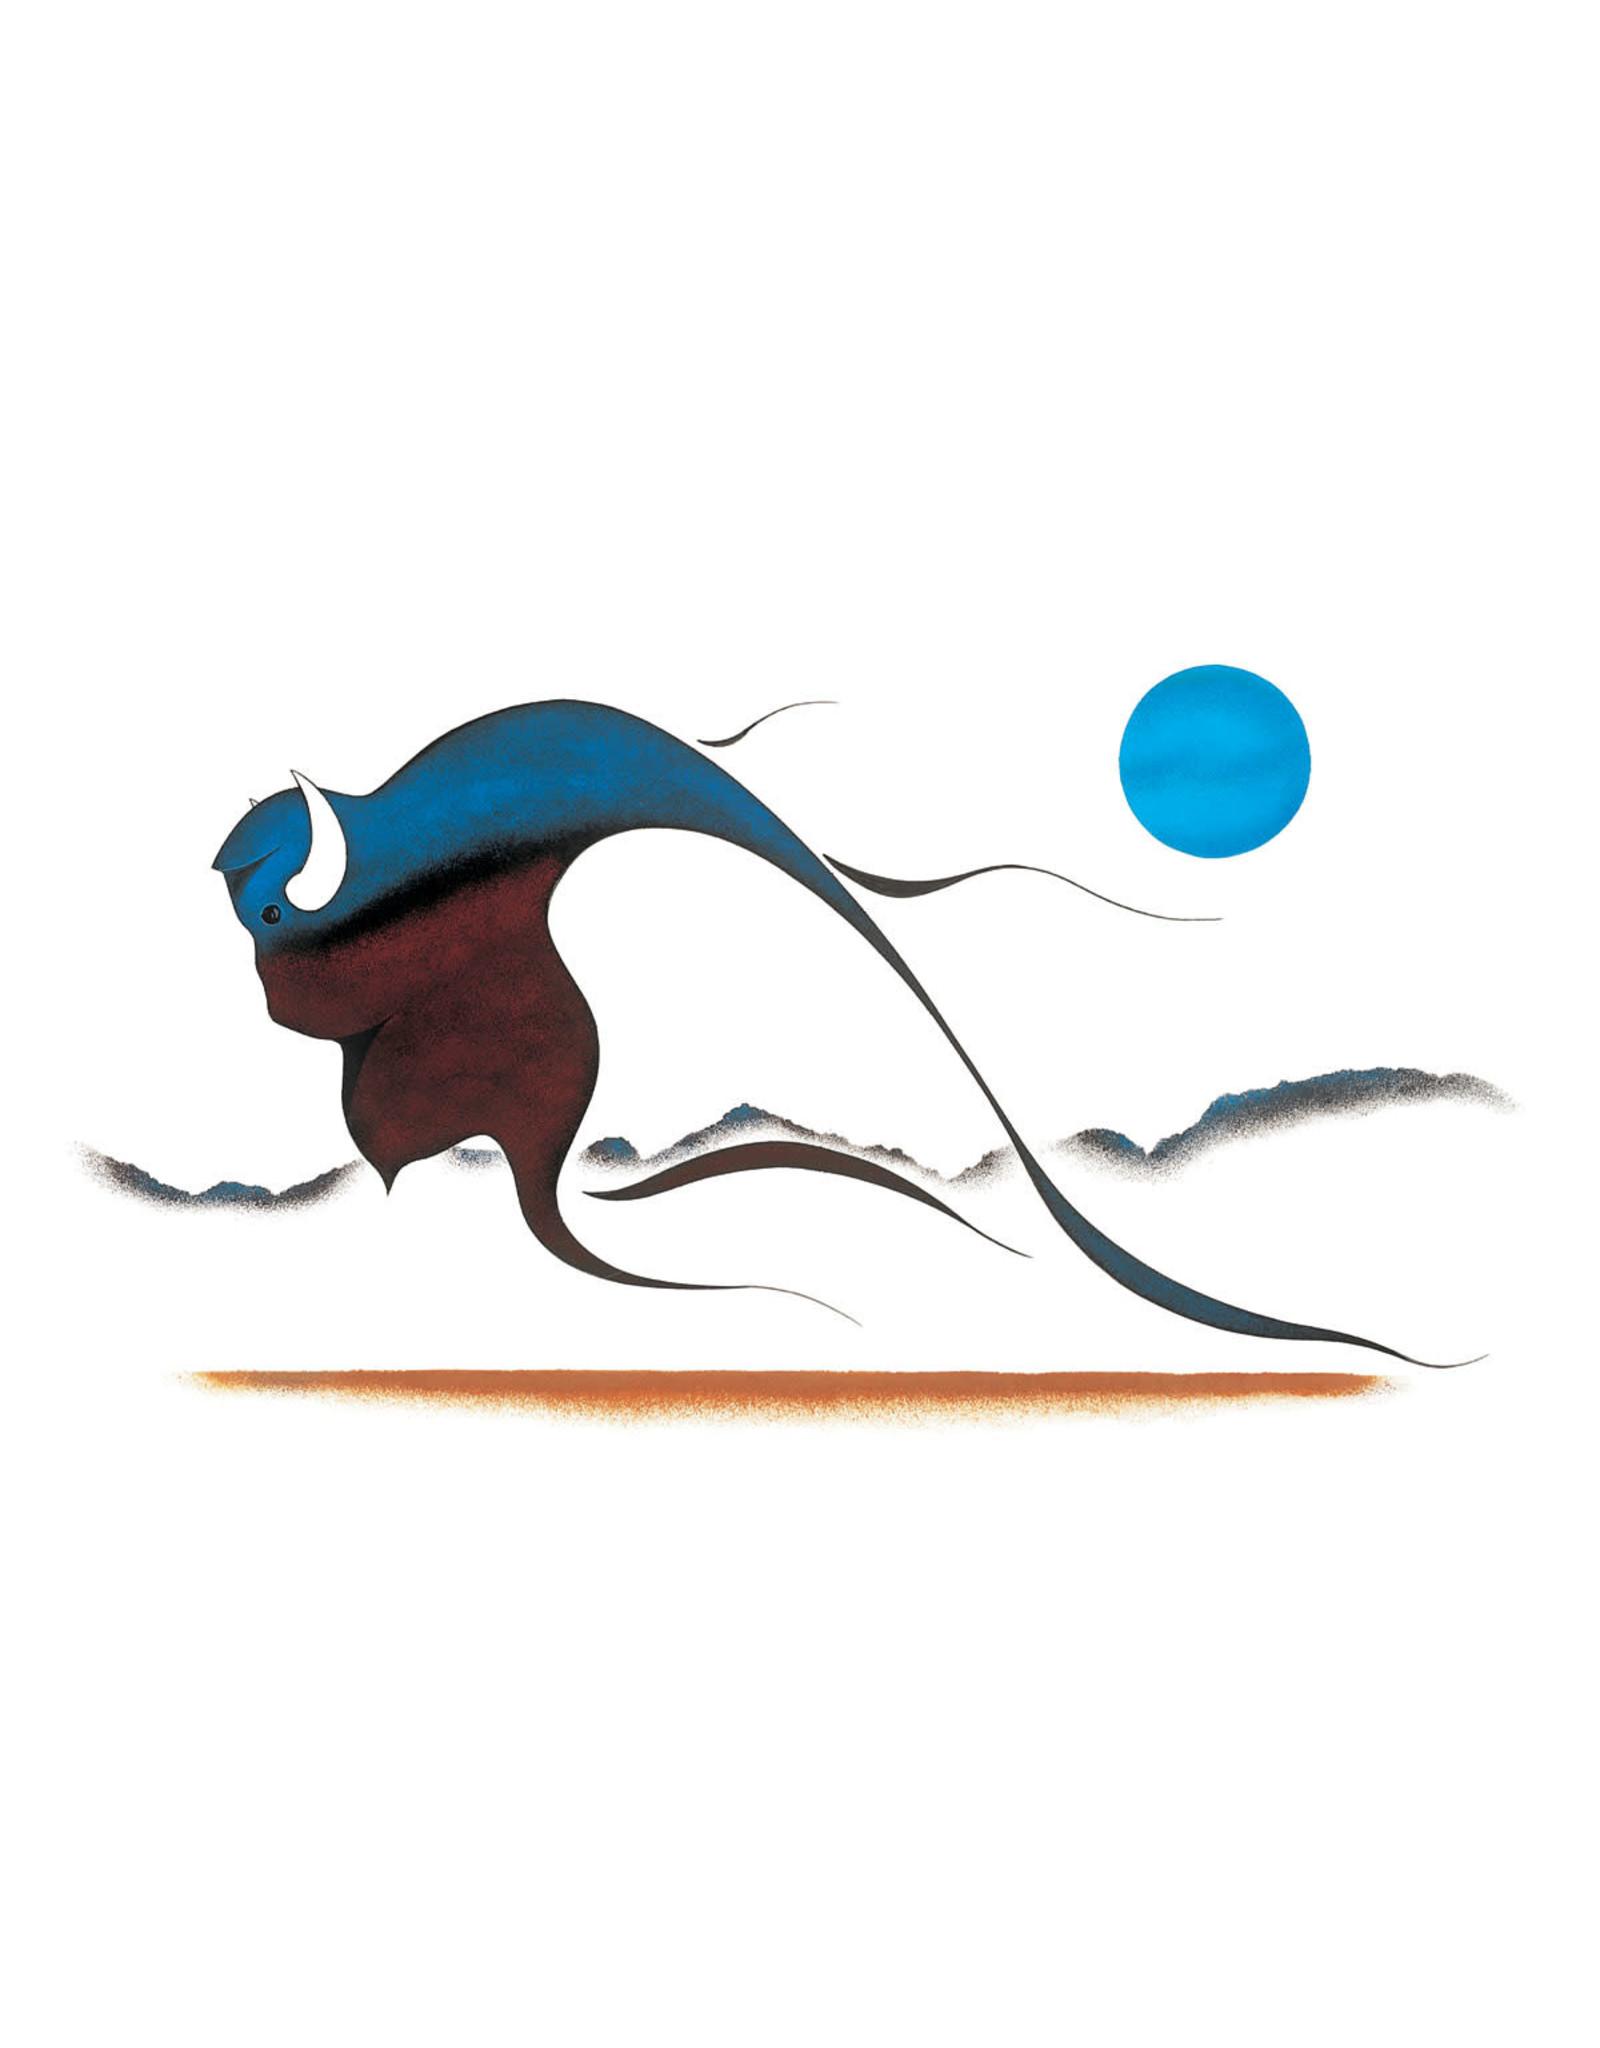 Buffalo Spirit par Isaac Bignell Édition Limitée